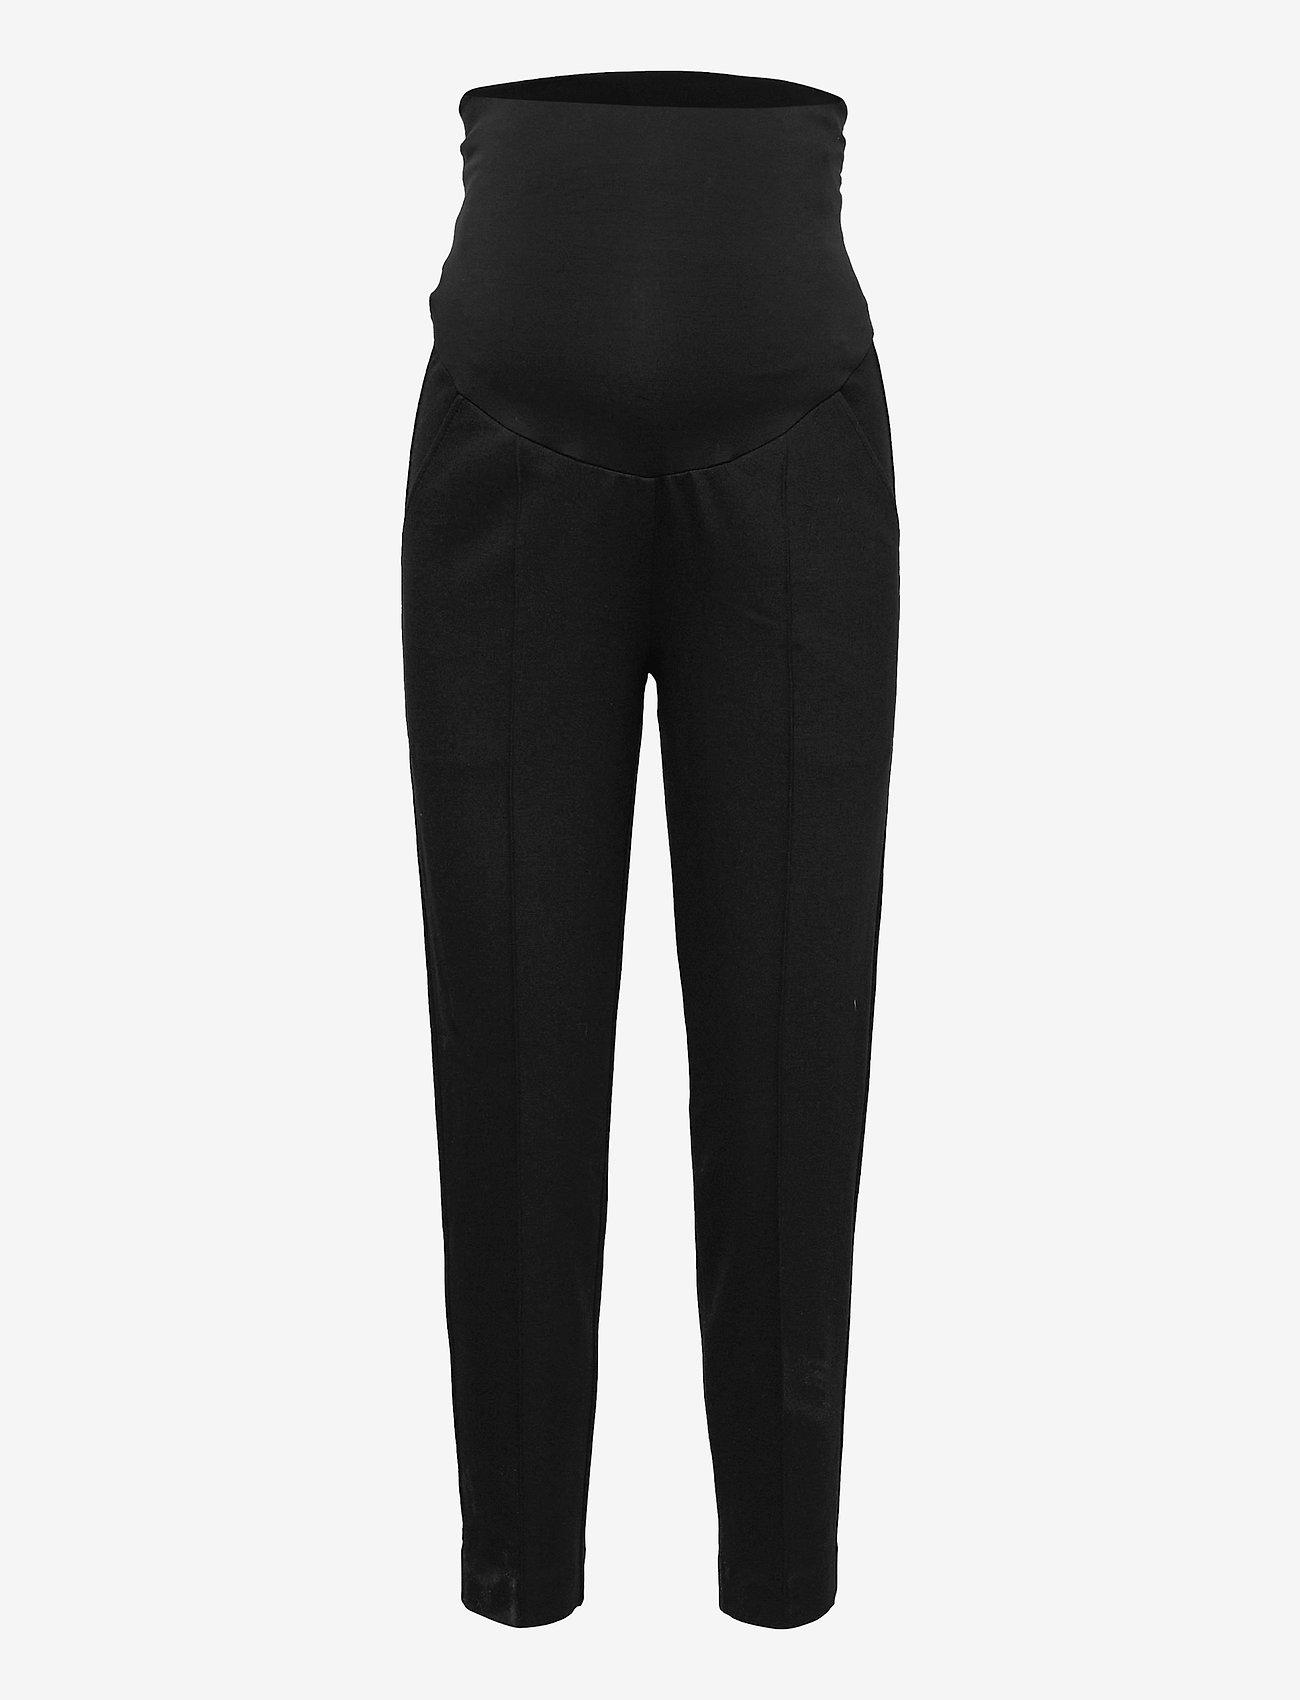 Boob - OONO cropped slacks - casual bukser - black - 1